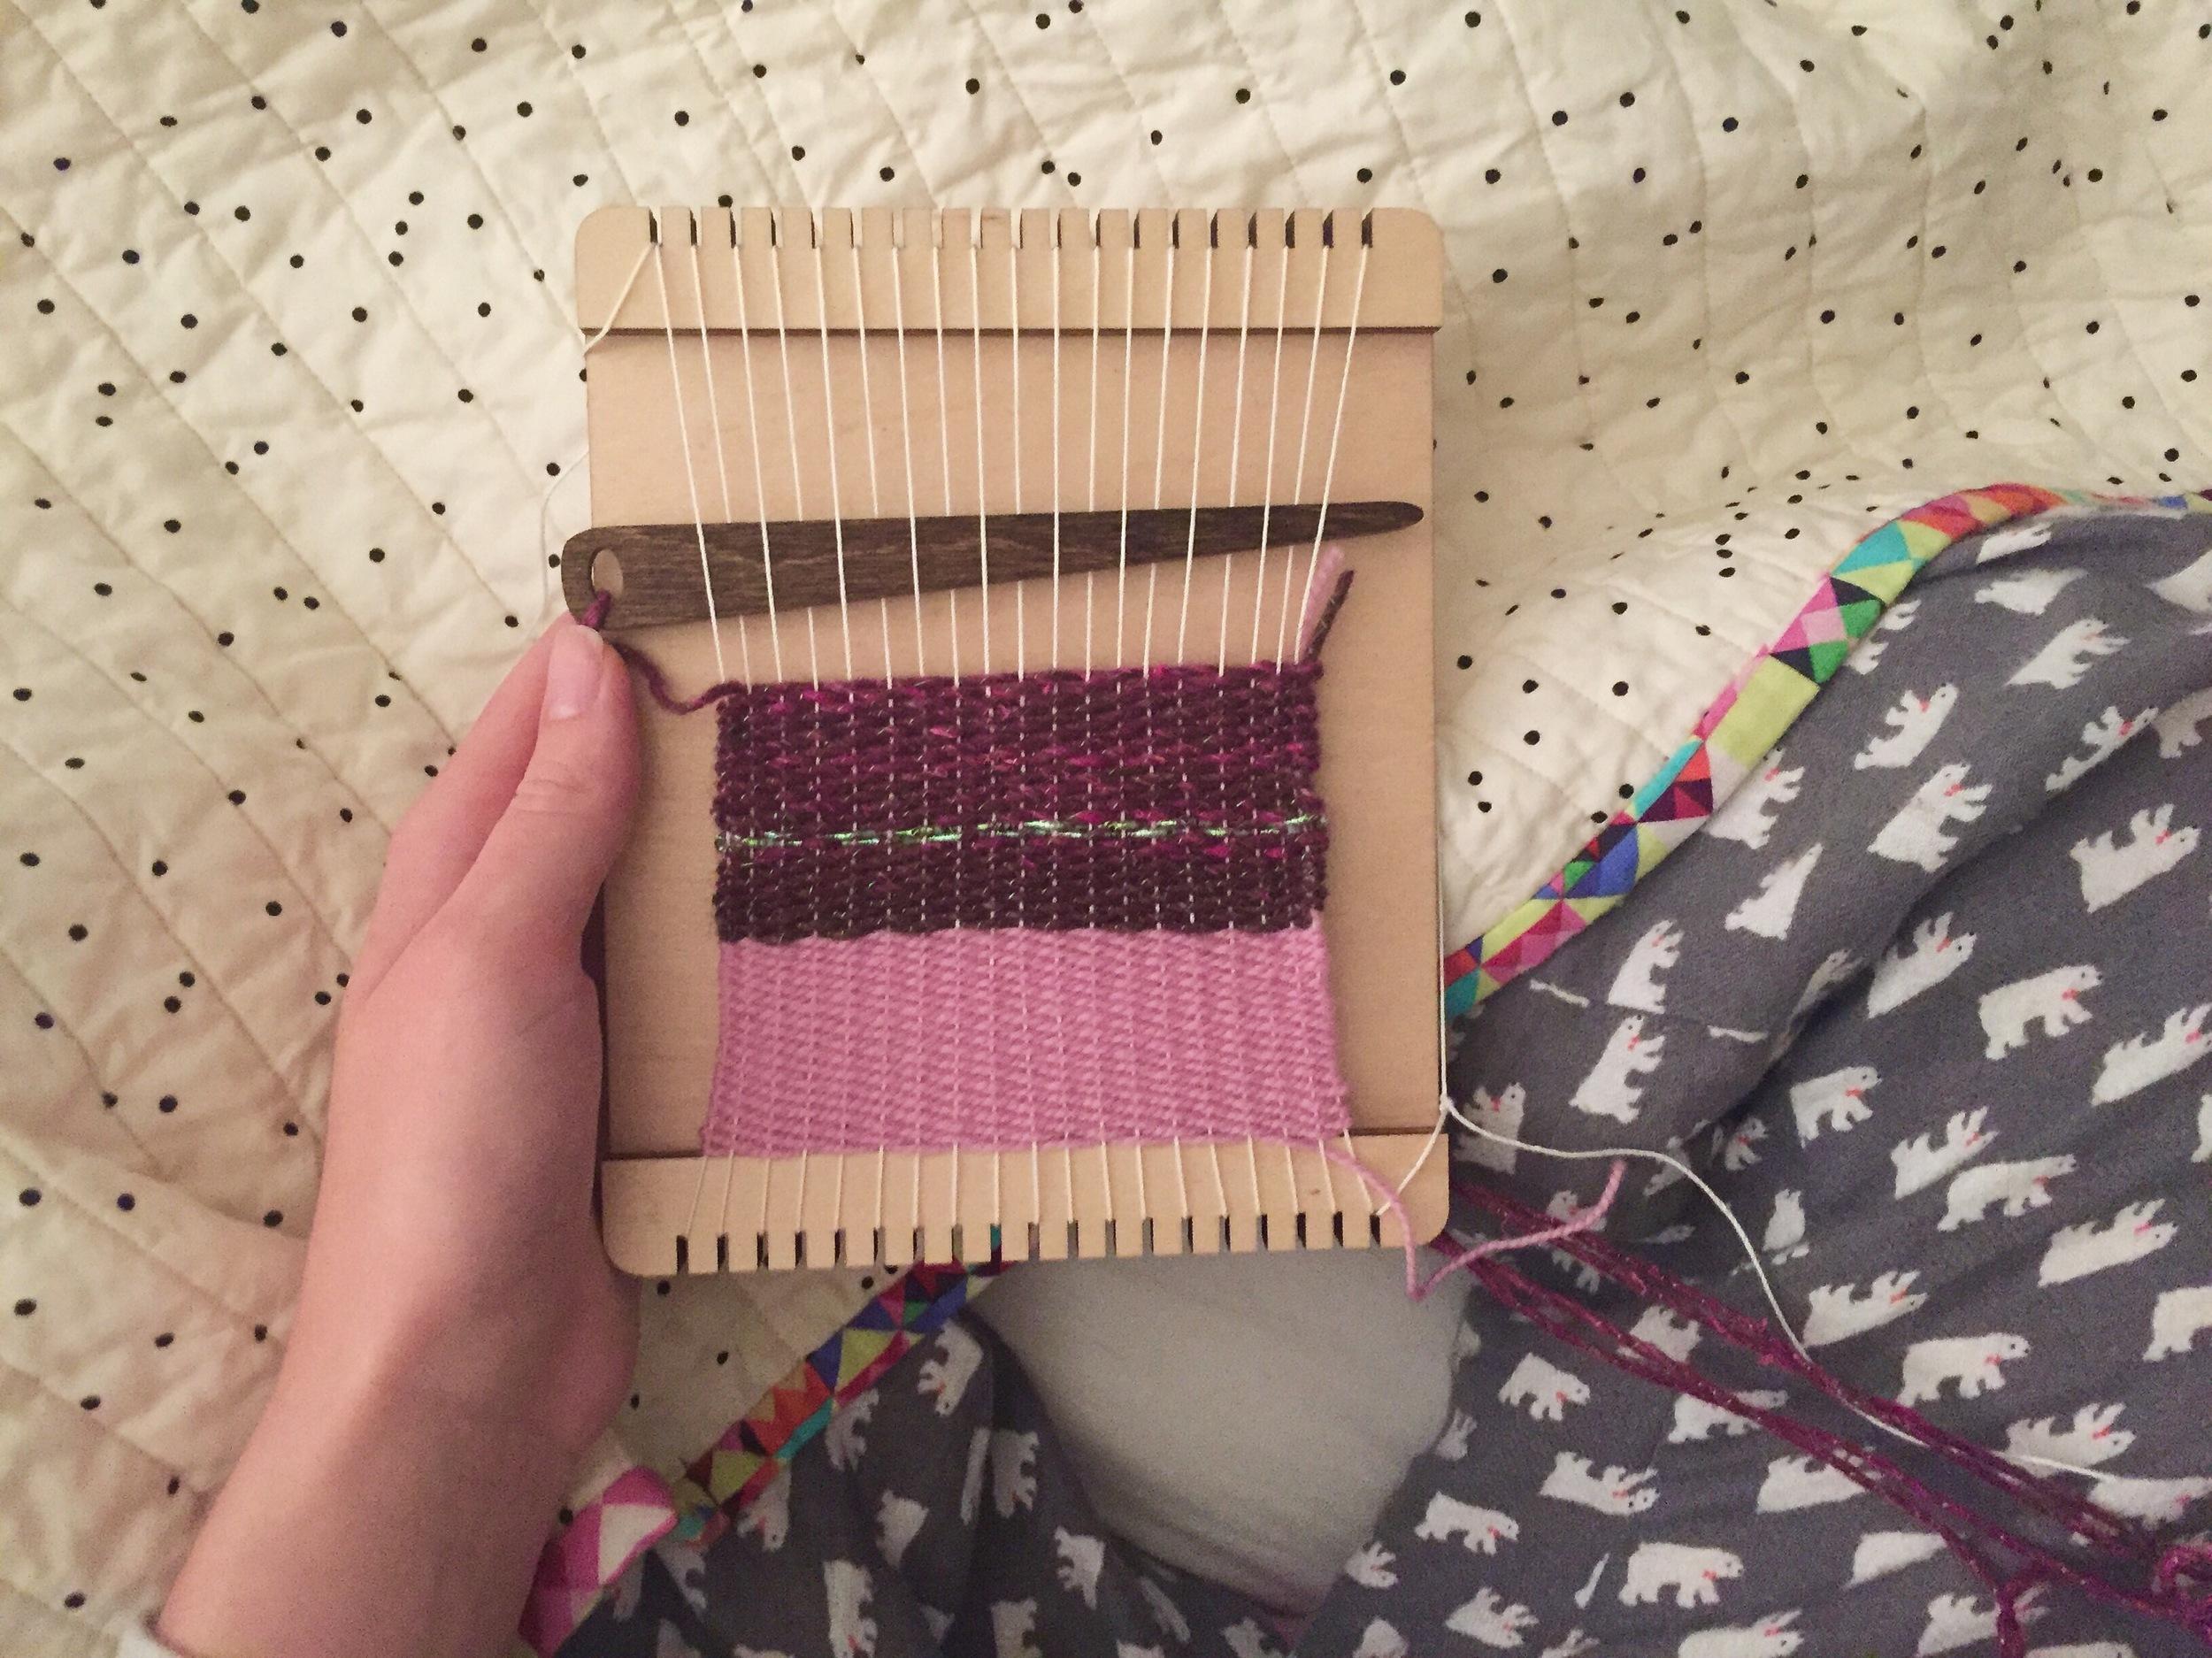 Gettin' cozy with my mini loom.